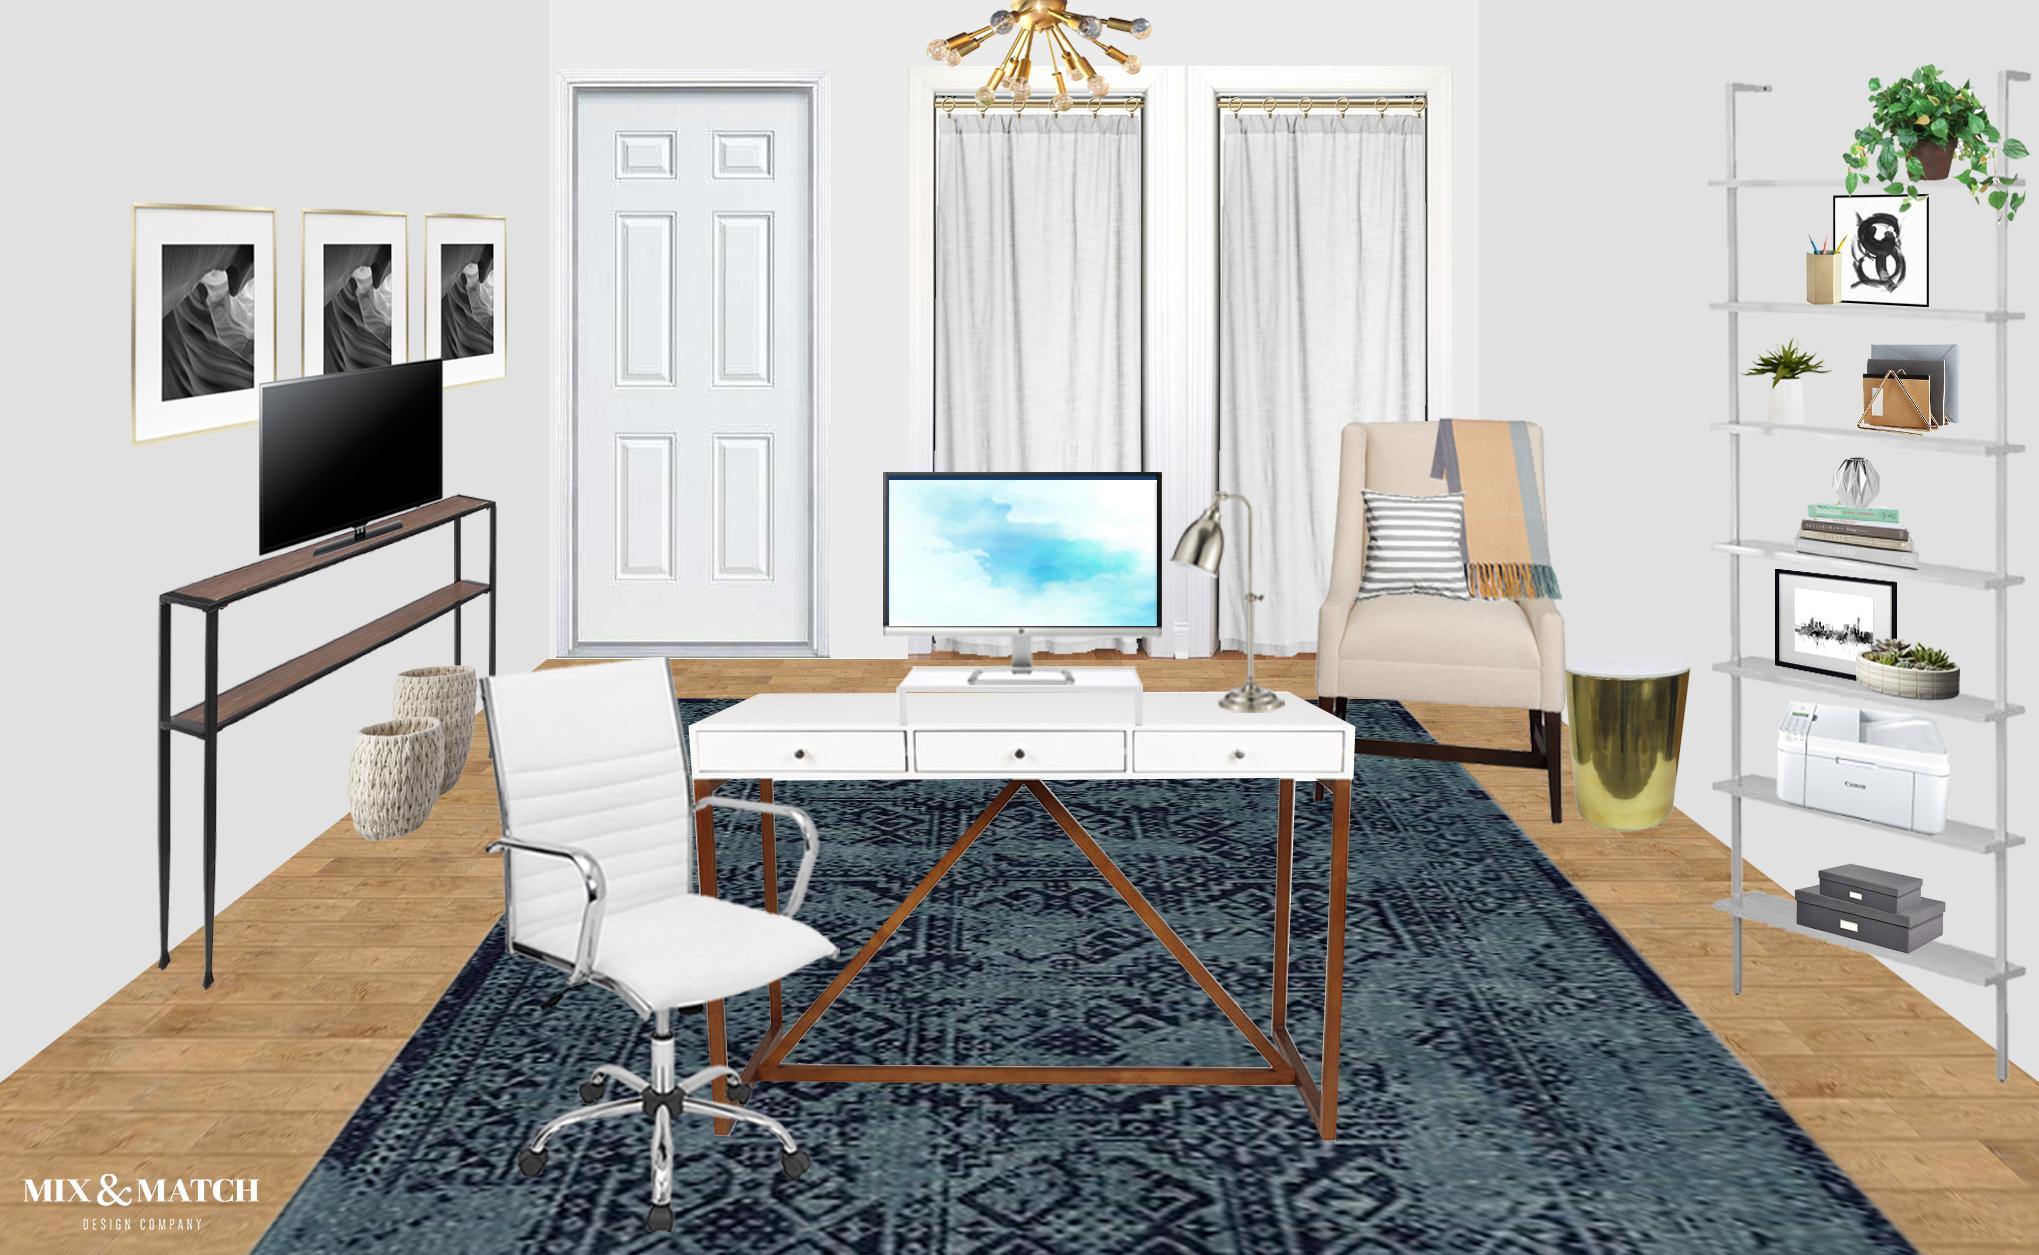 Mix-&-Match-Office-Makeover-Design-Board-2.jpg